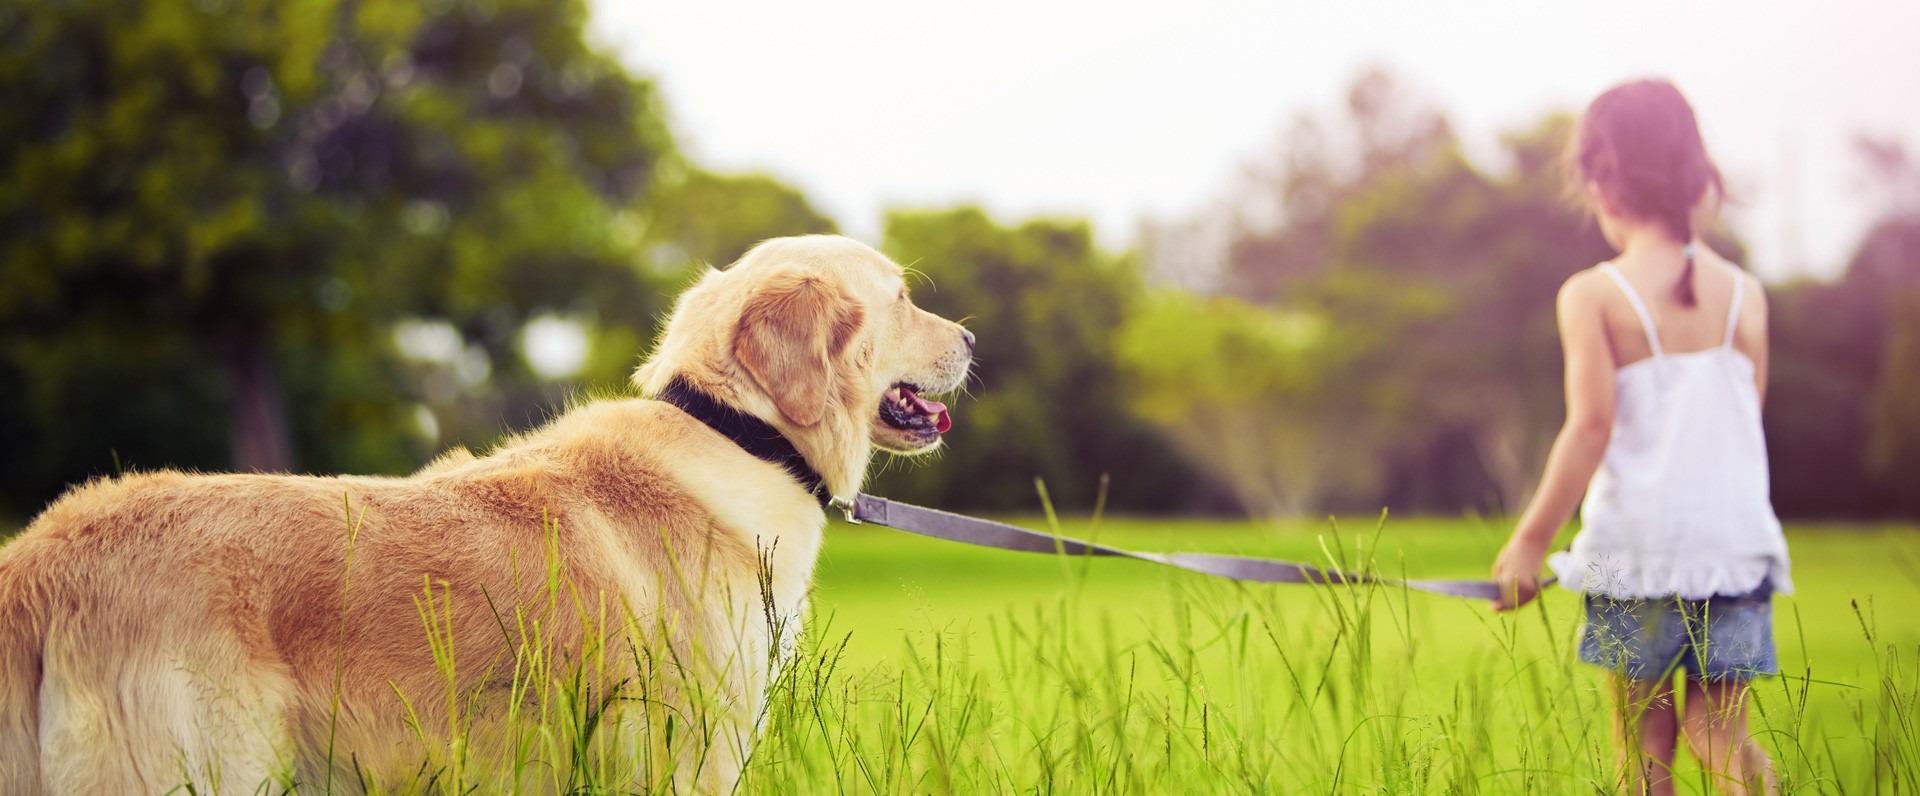 veterinaria bh, veterinaria vethealing, veterinaria belo horizonte, veterinaria santo agostinho, vet healing bh